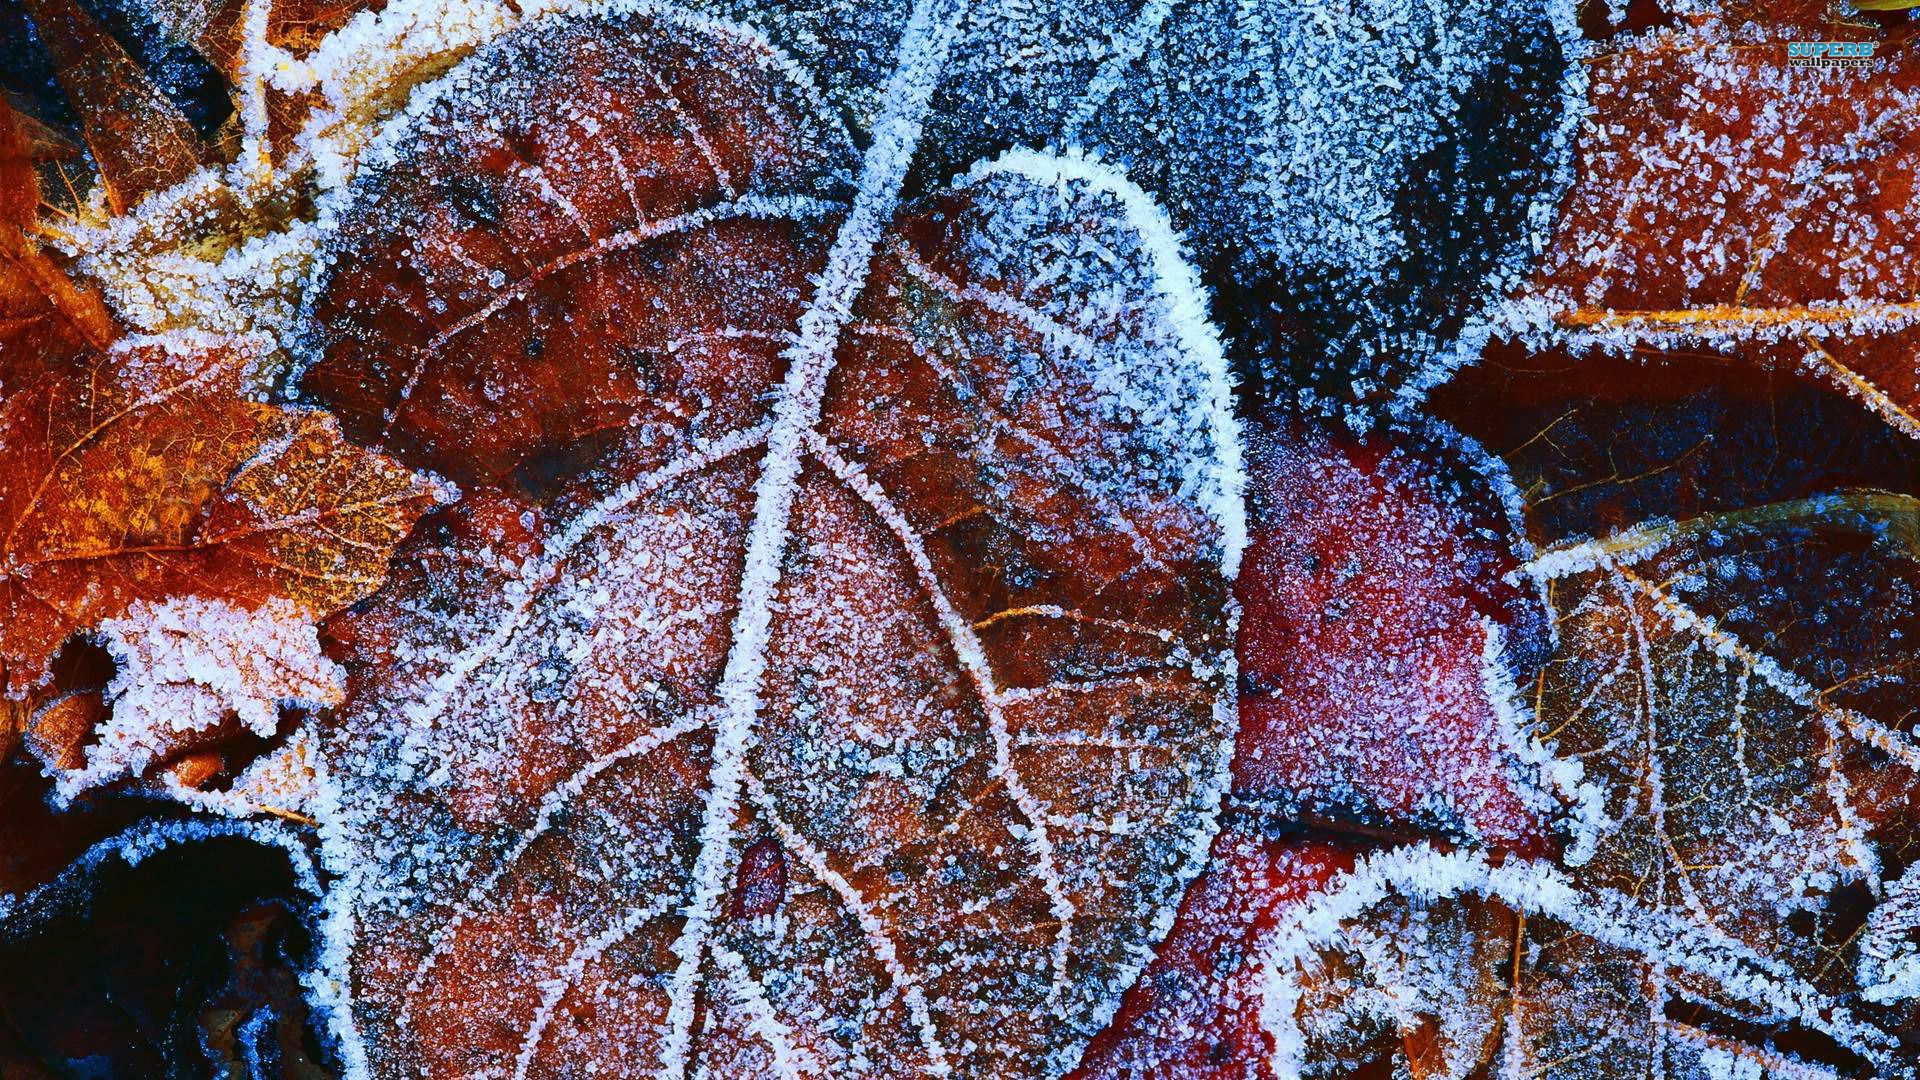 Frosty Autumn Leaves Hdpicorner